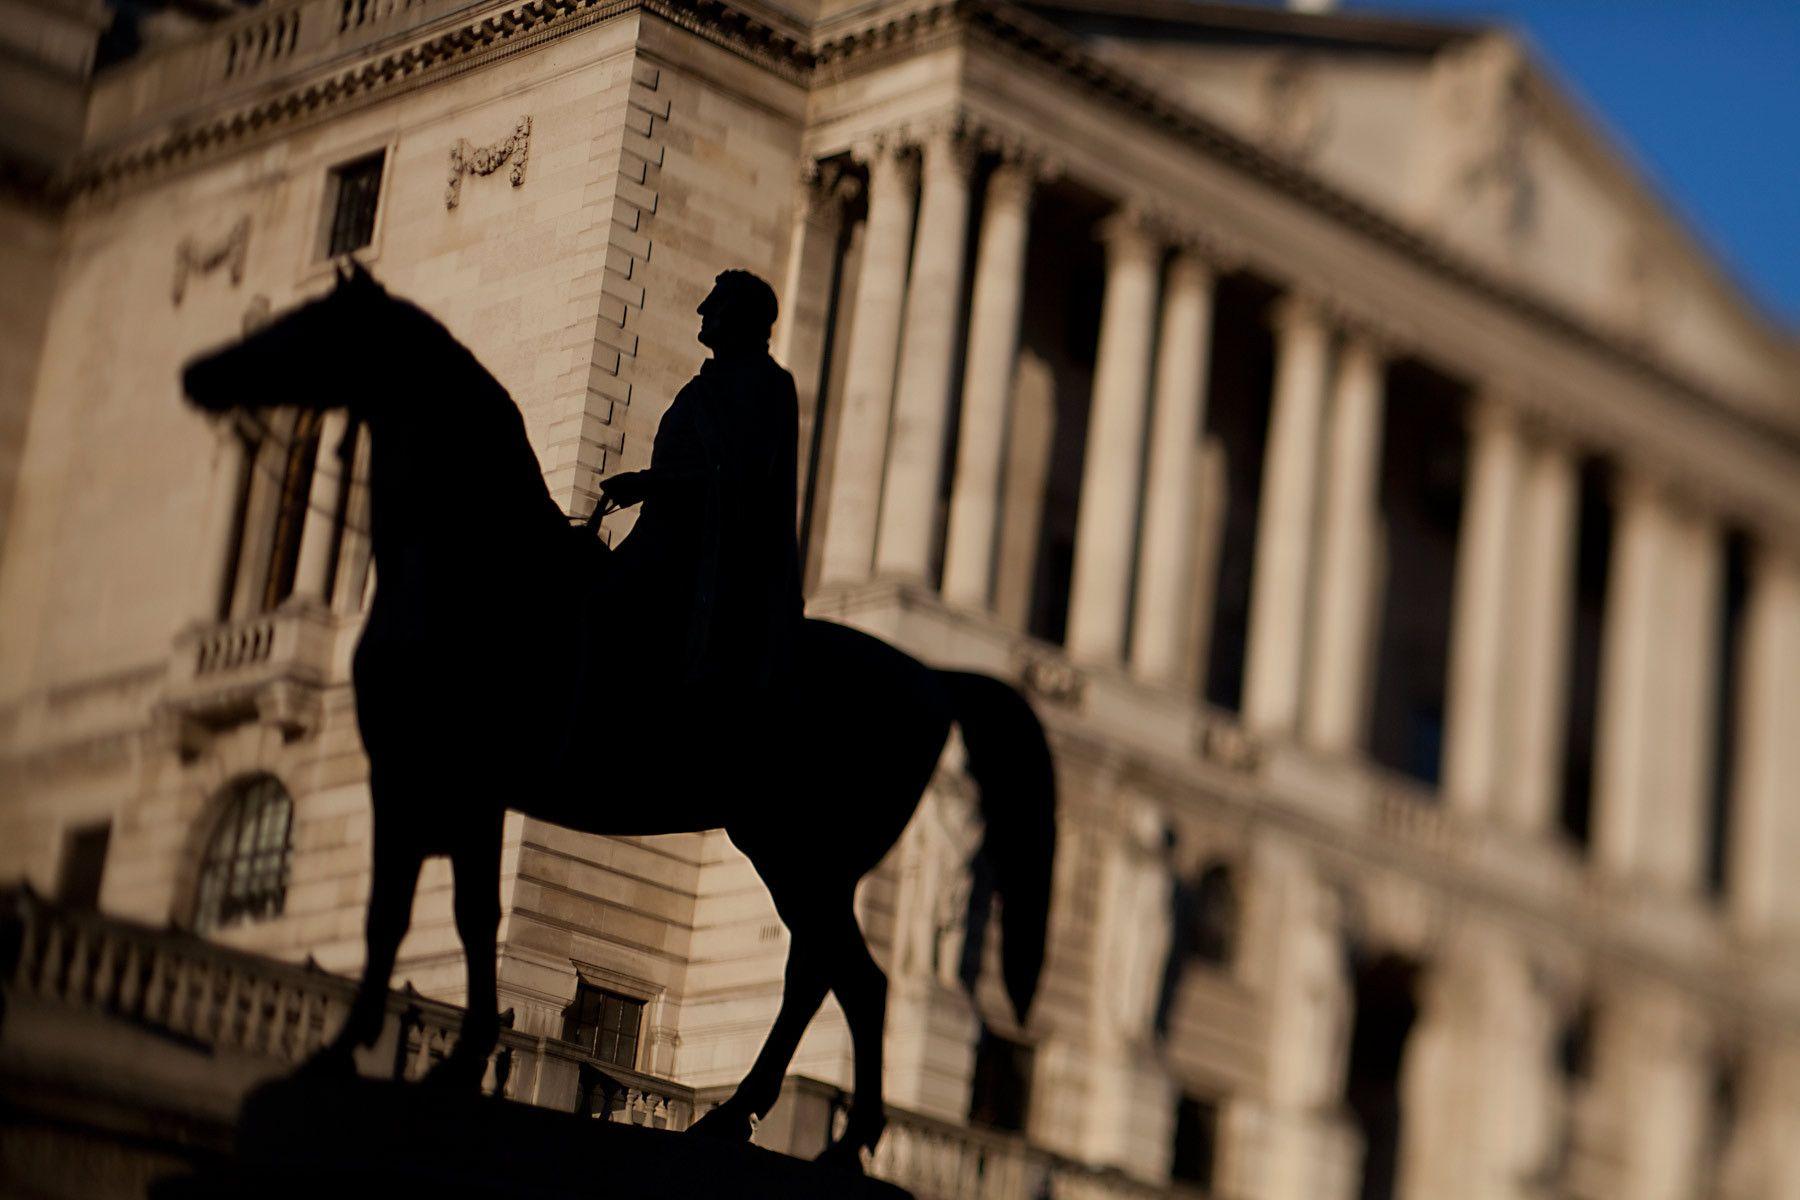 Wellington & The Old Lady of Threadneedle Street